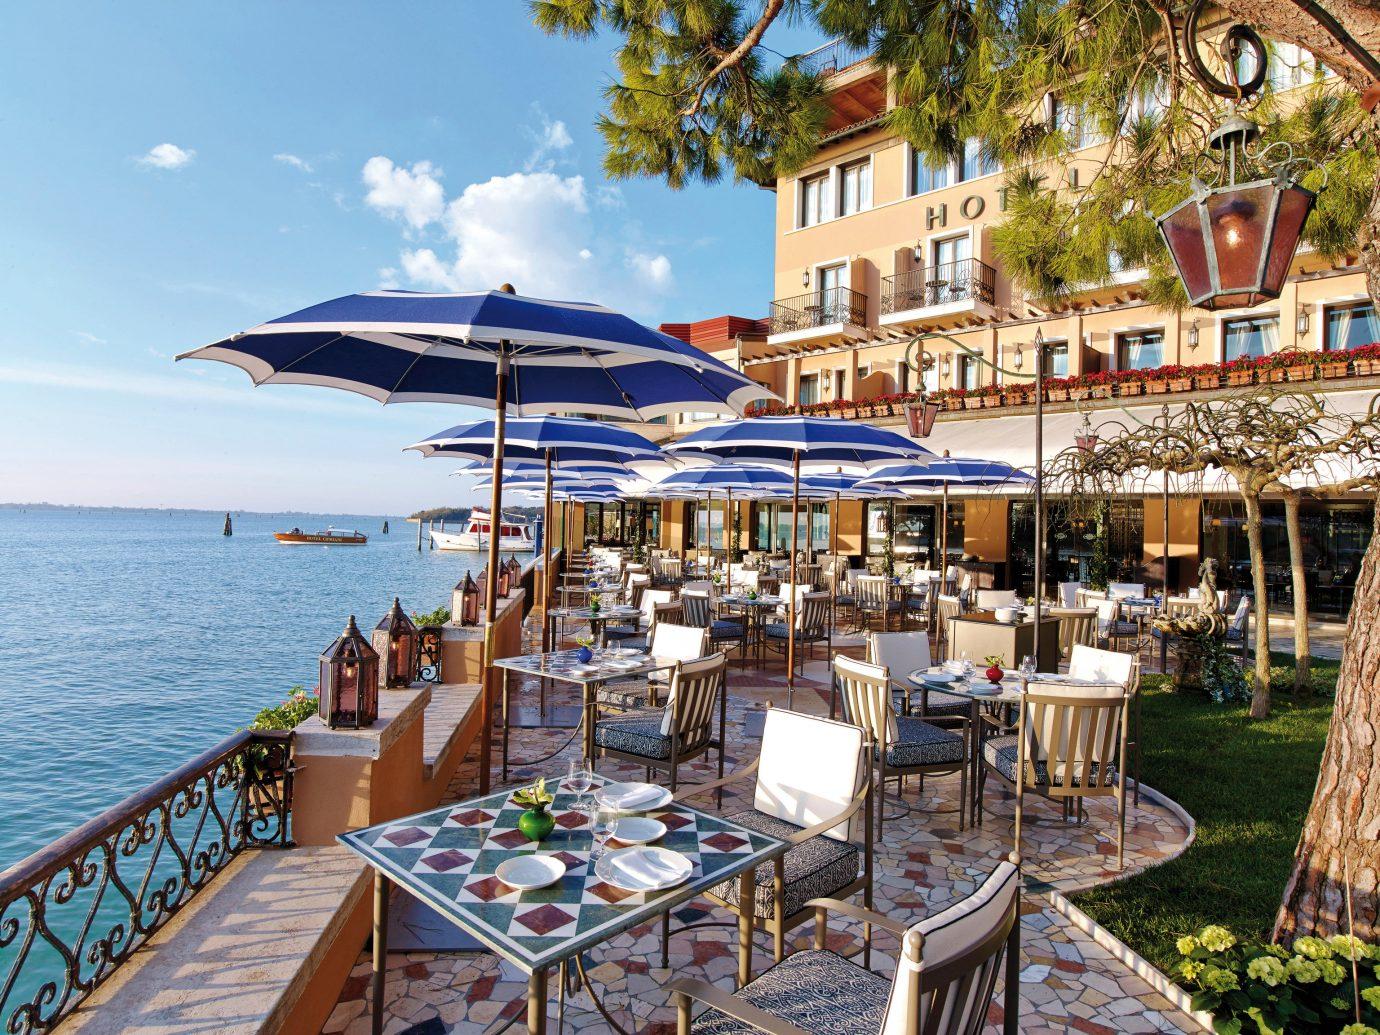 Celebs Hotels Trip Ideas Resort tourism vacation leisure real estate outdoor structure hotel resort town restaurant